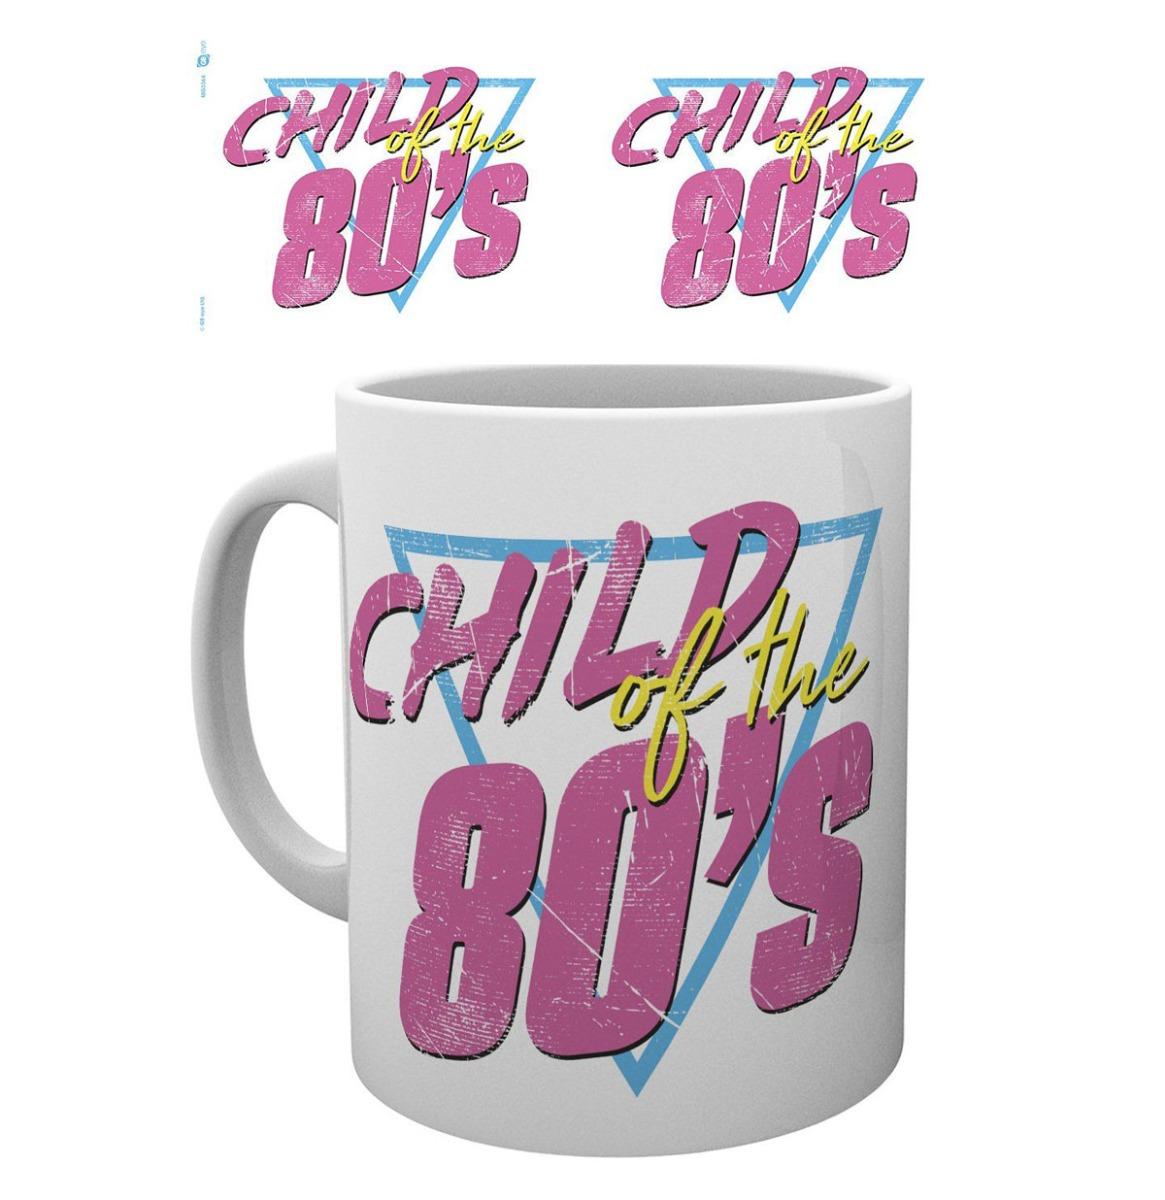 Retro Chic: Child of the 80's Beker